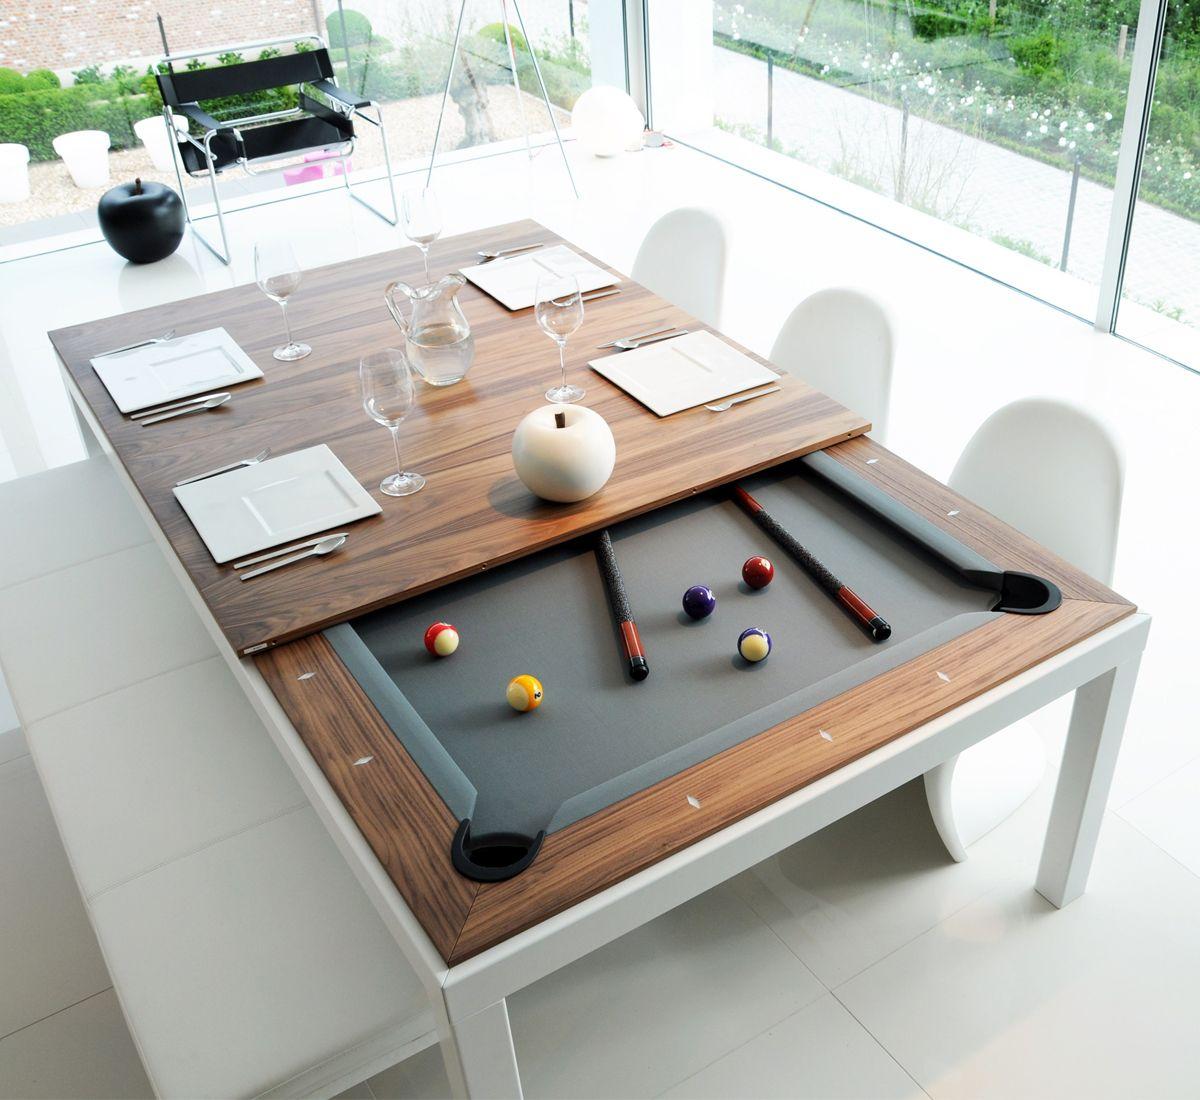 Fusiontables Fusion Table Dining Table Biliards Meja Bilyar Meja Makan Rumah Modern outdoor pool table